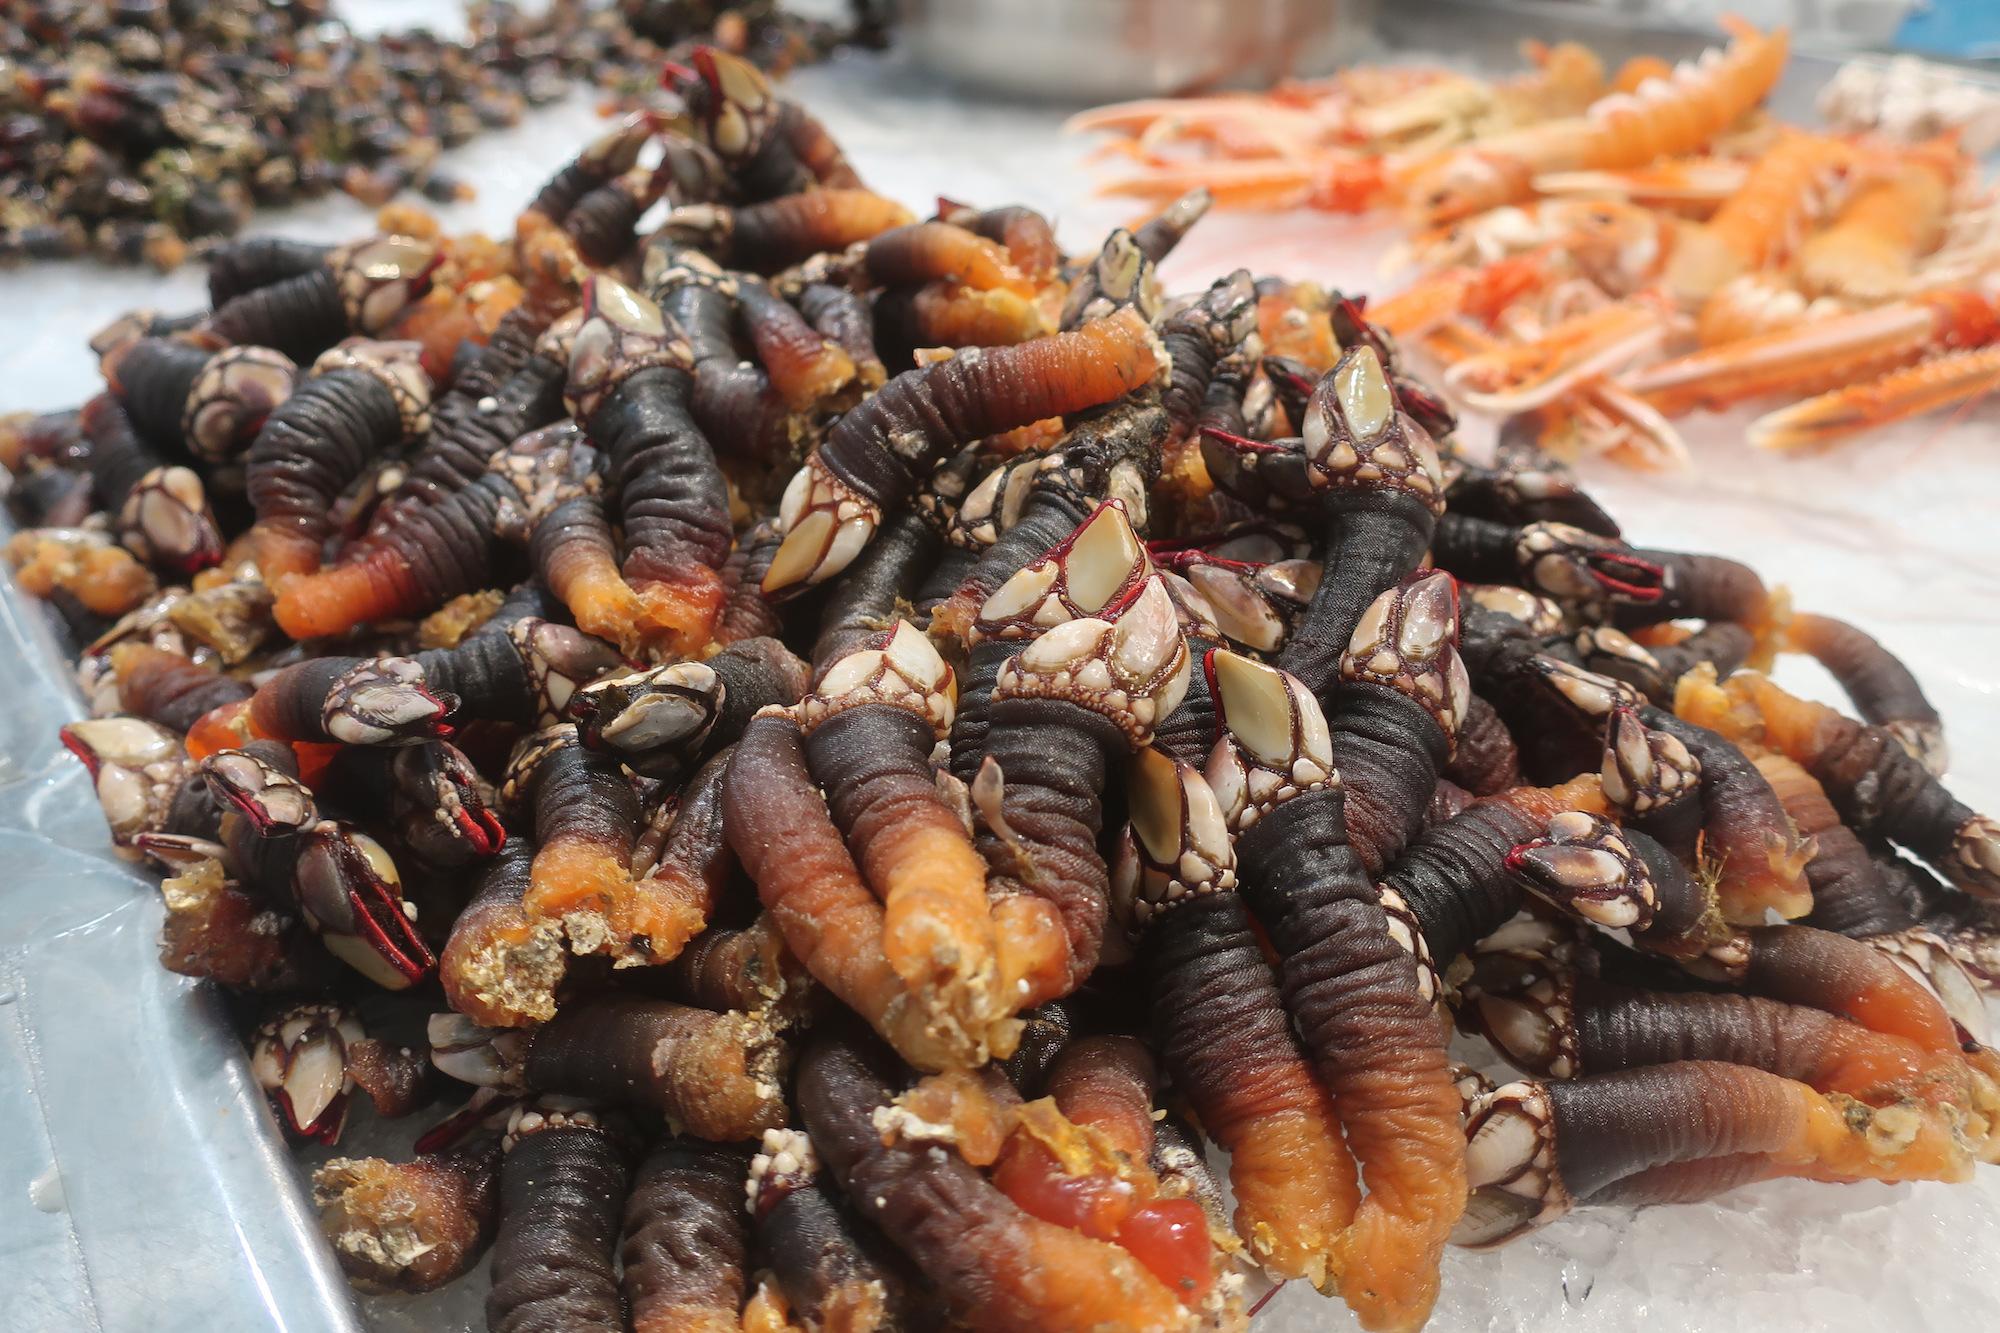 goosenack barnackes